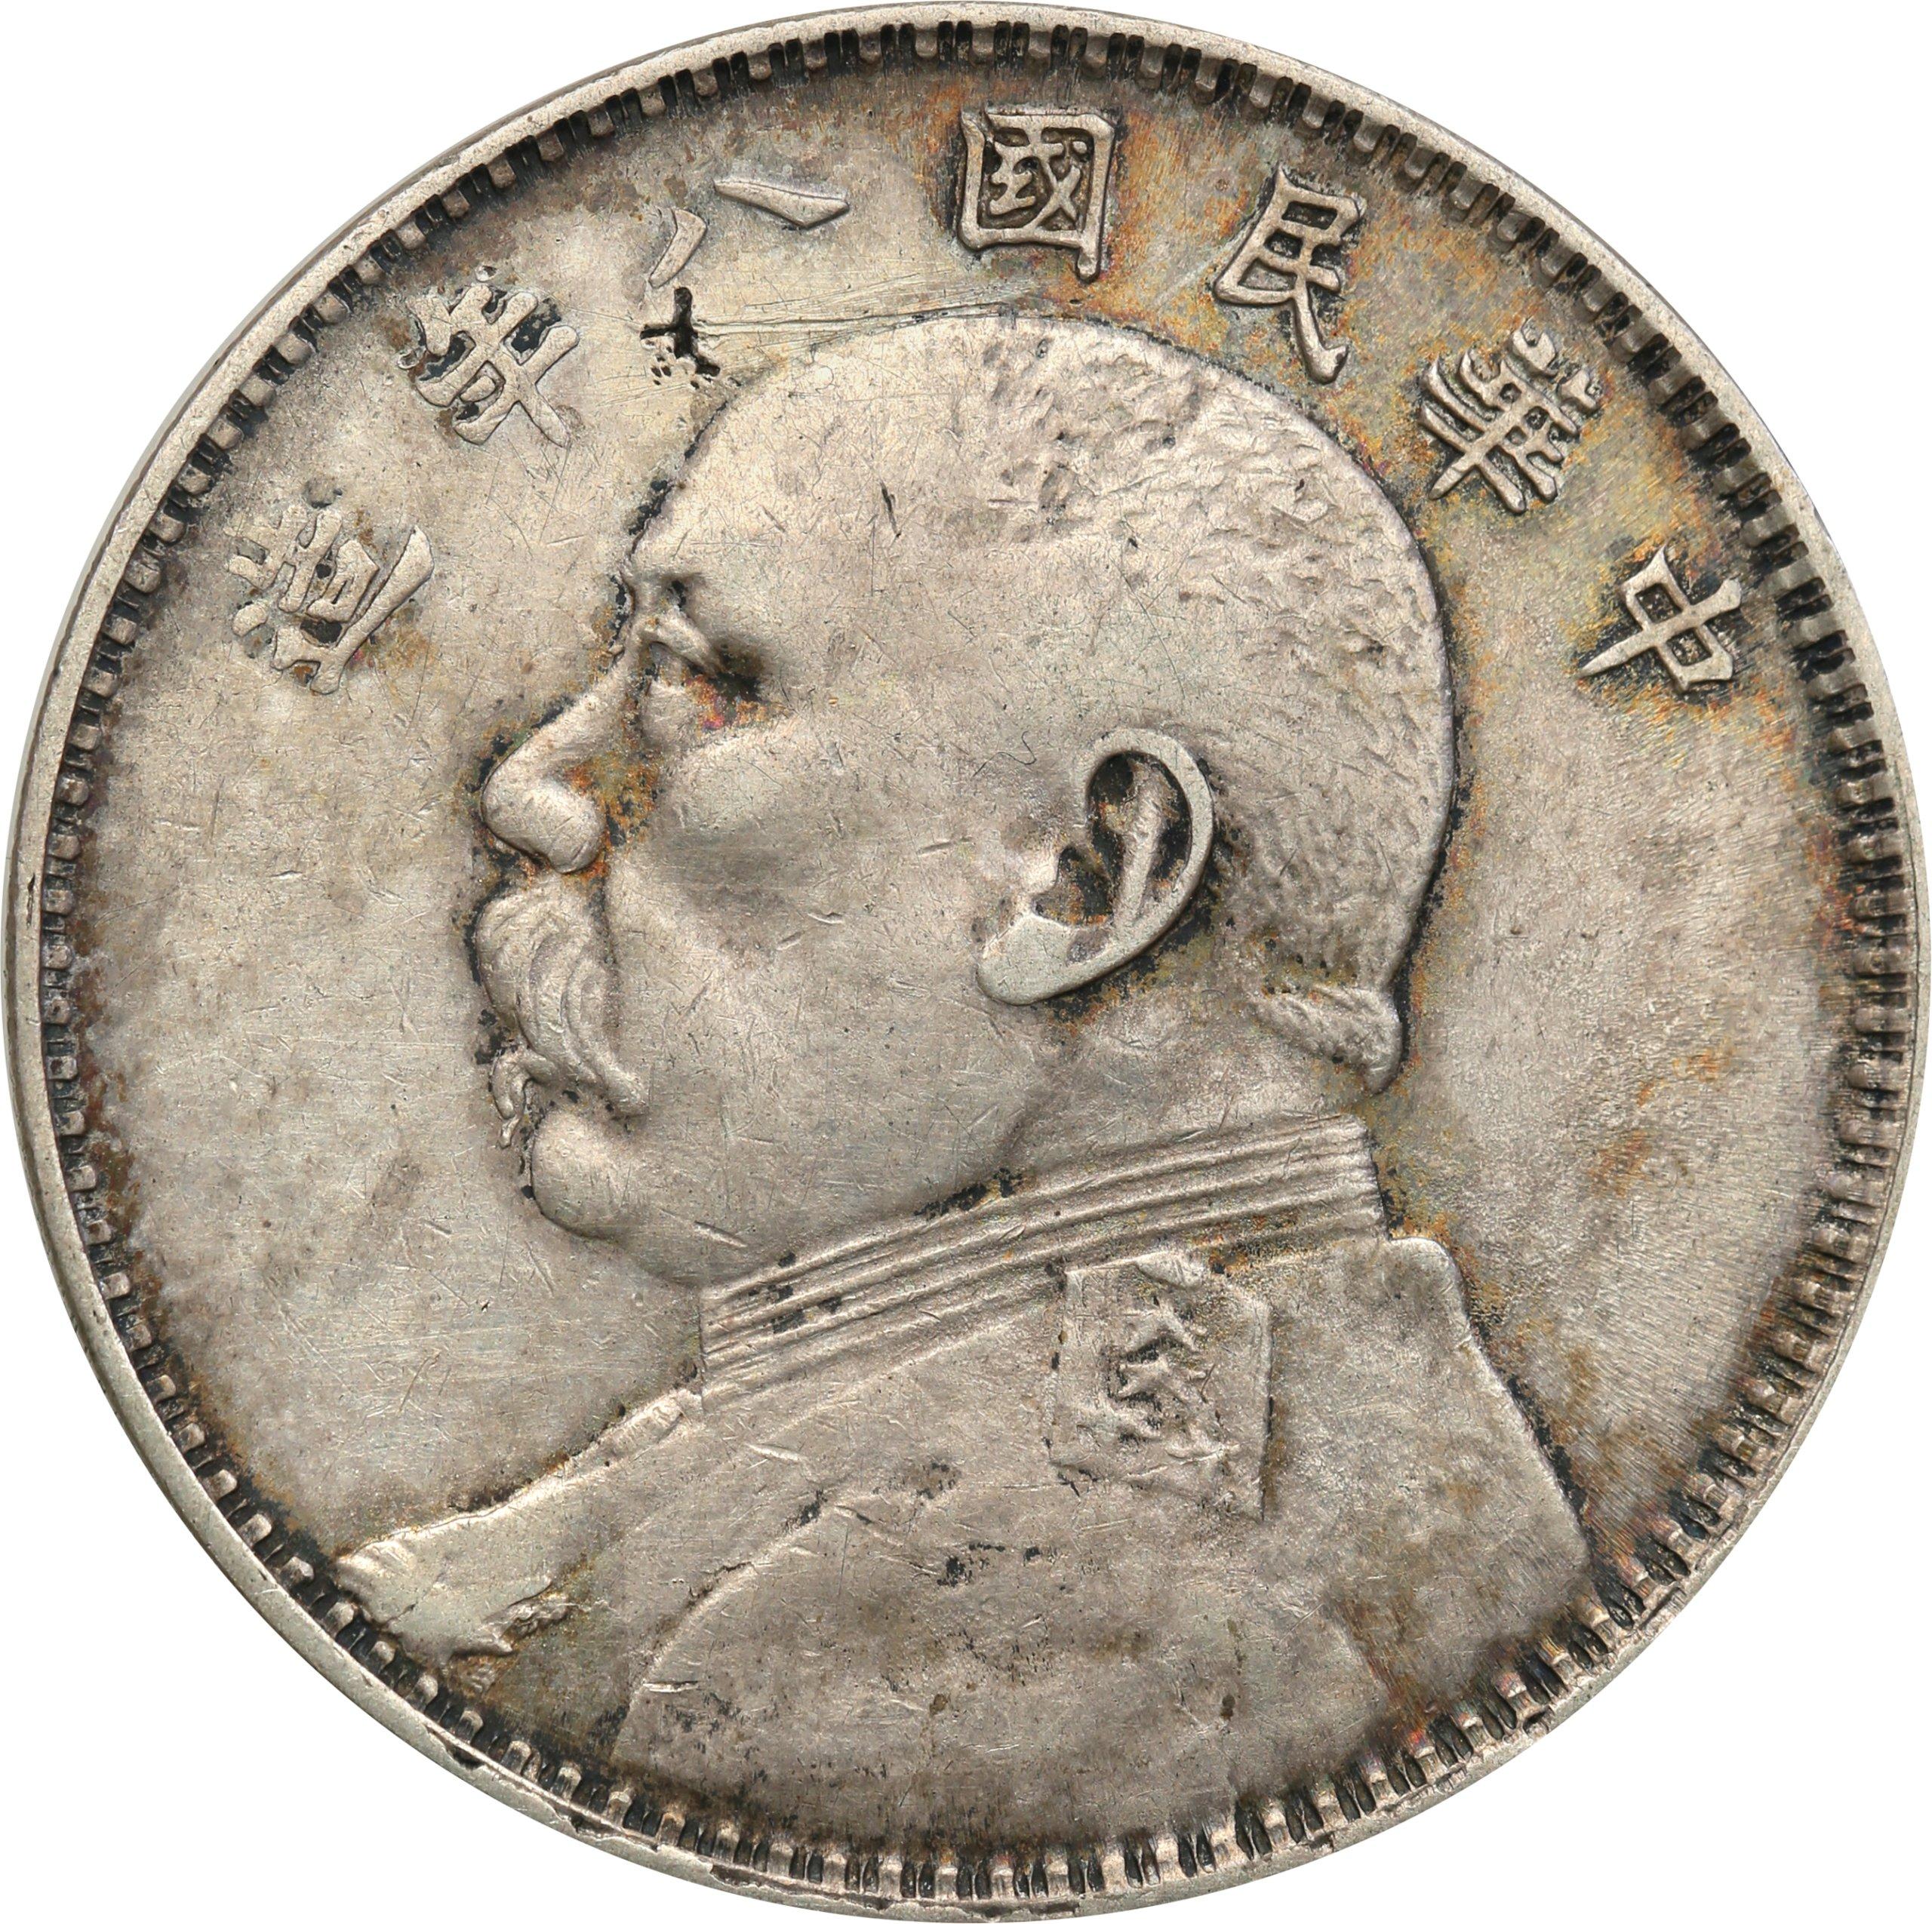 Chiny Repub. 1 Yuan (dolar) b.d. Yr 8 (1919) st. 3